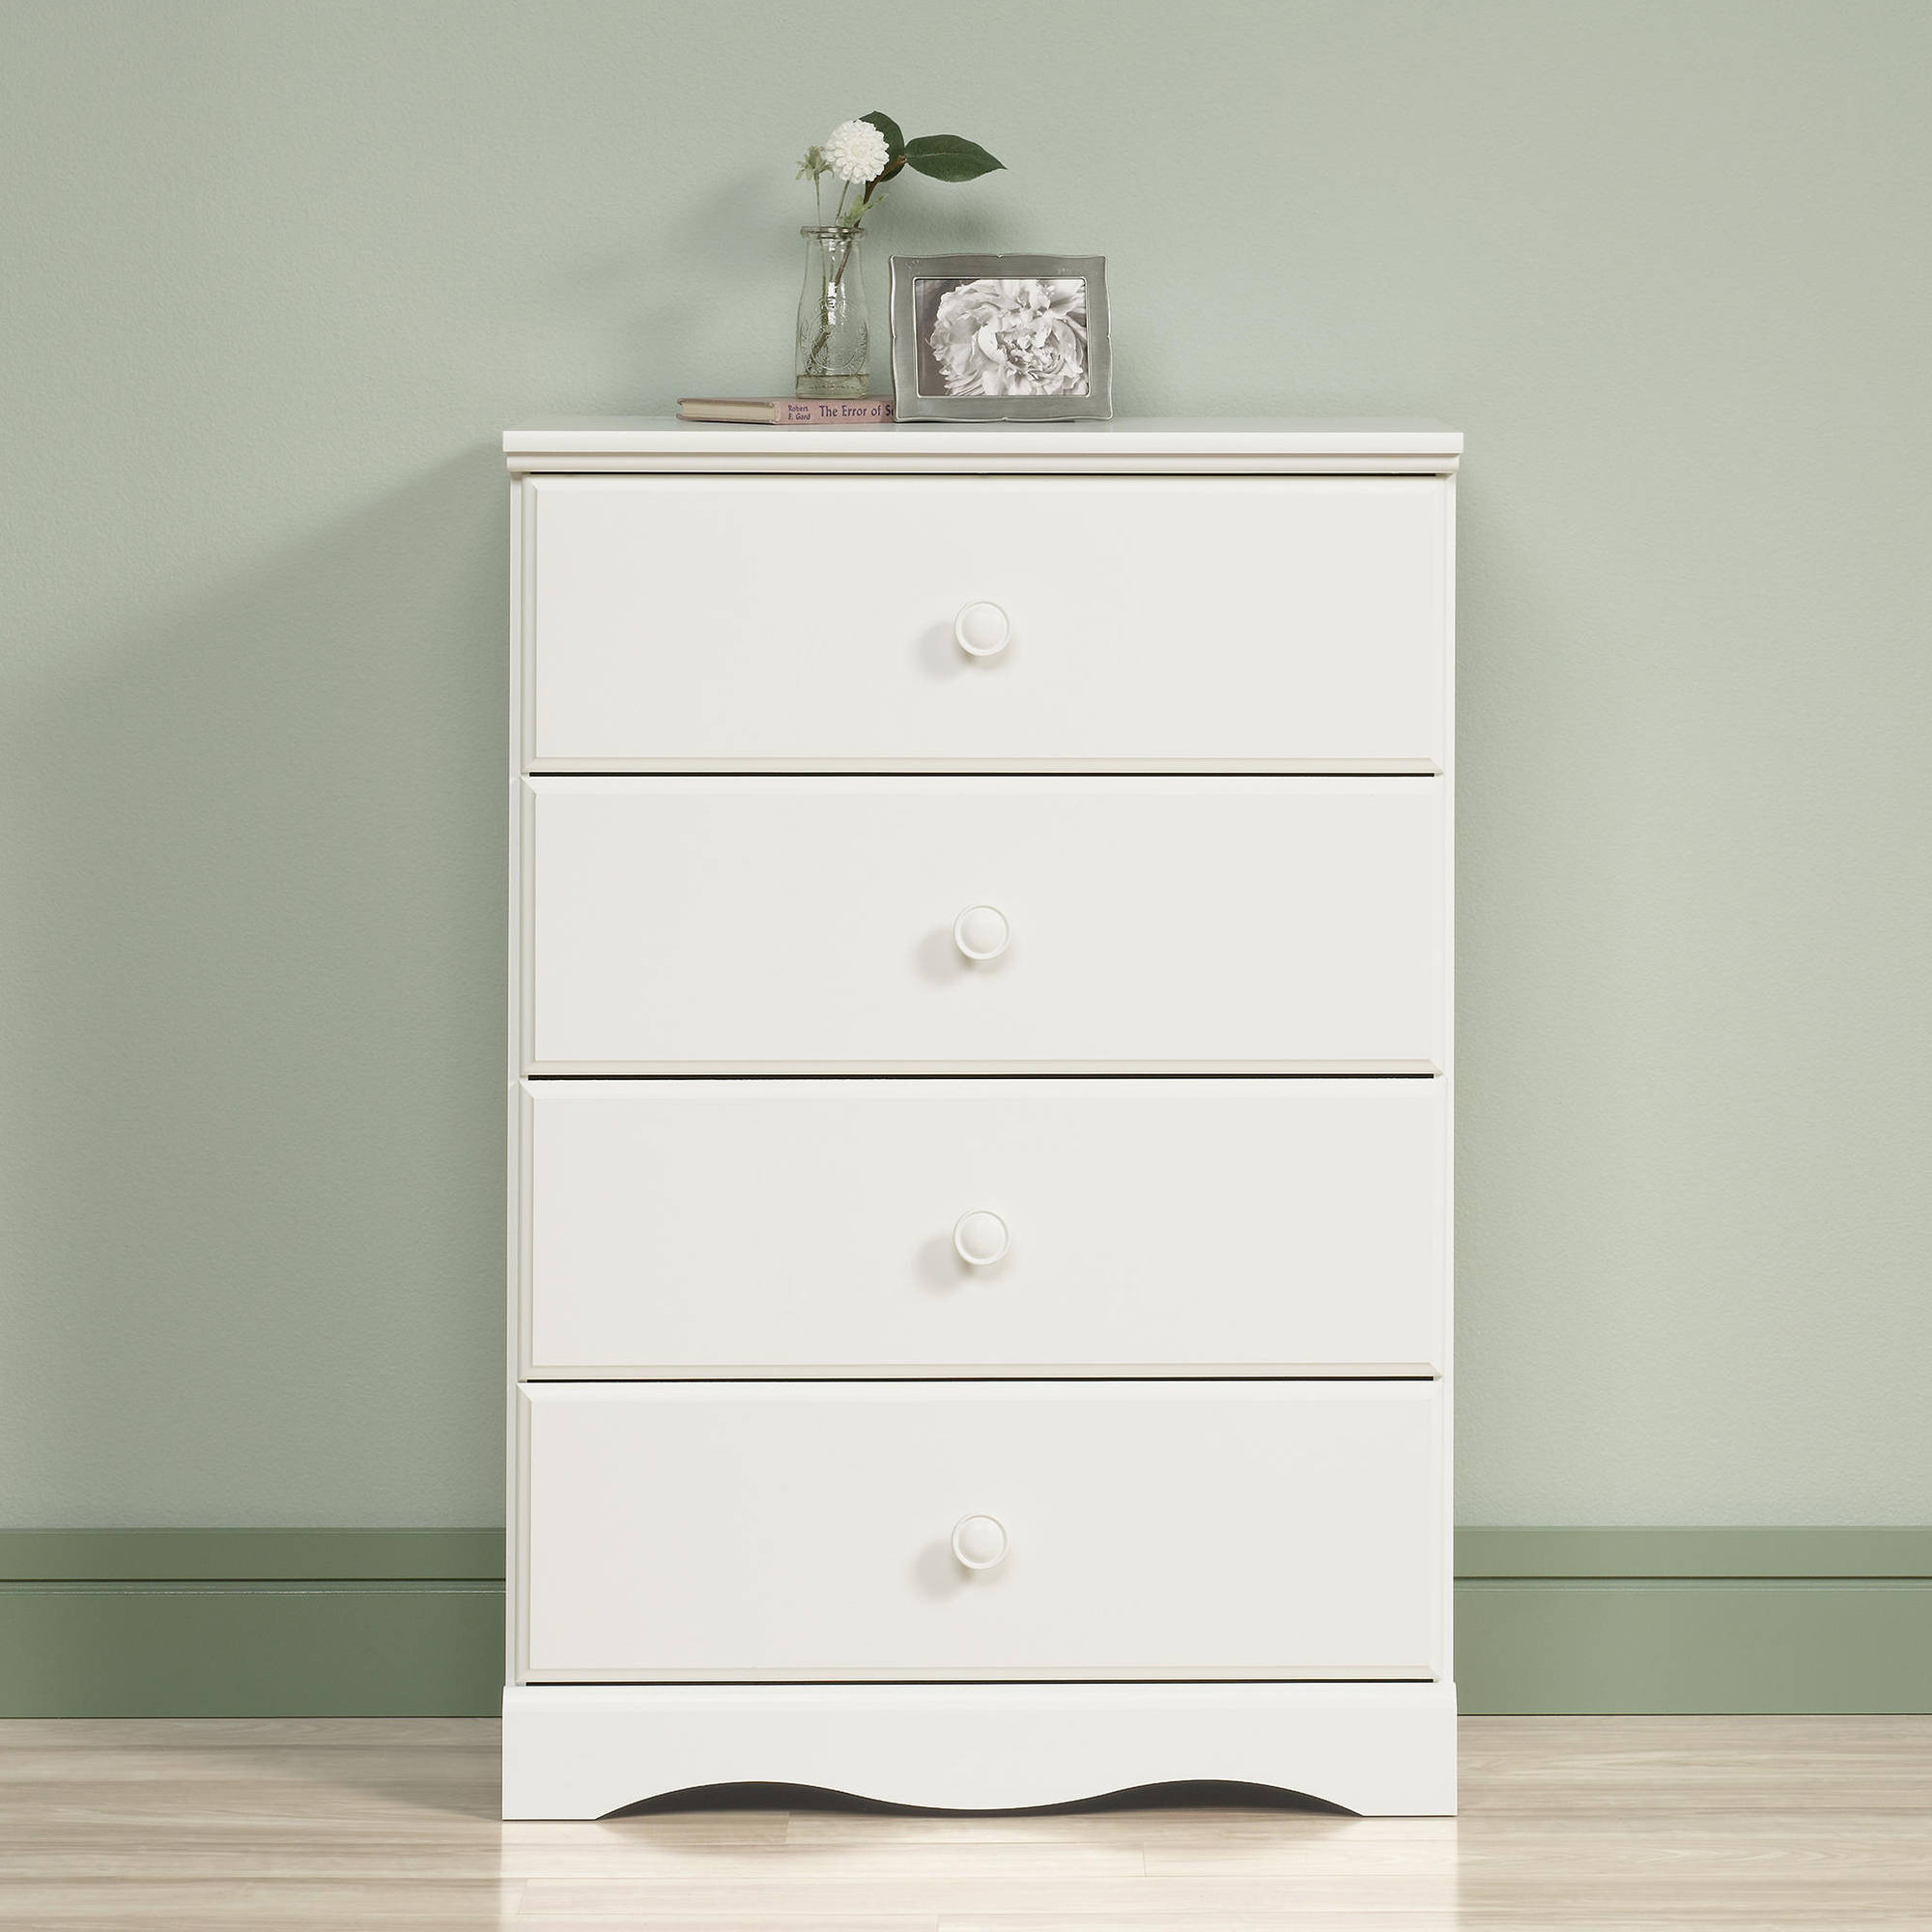 Sauder Storybook 4-Drawer Dresser, Soft White finish